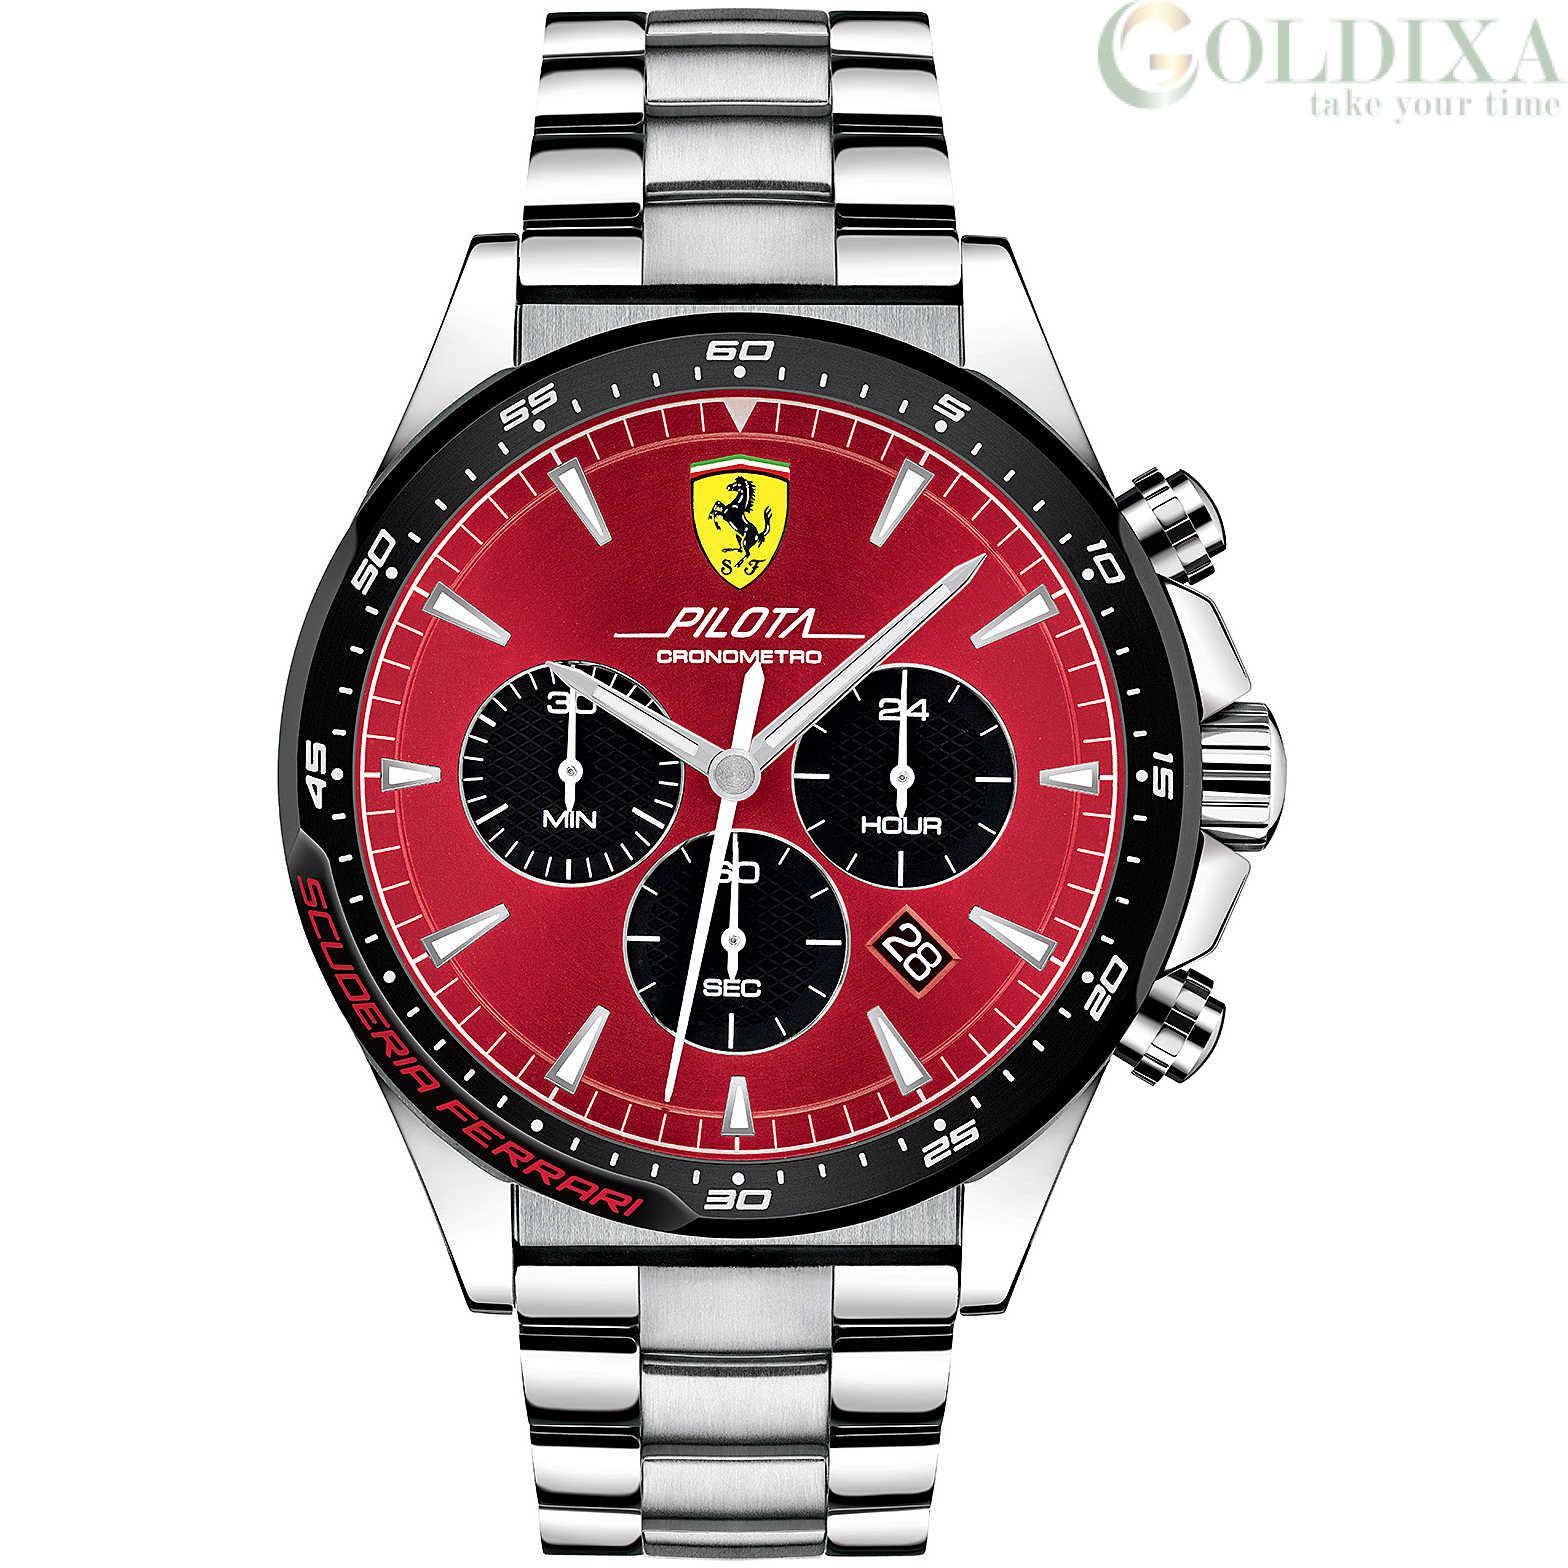 Watches Scuderia Ferrari Chronograph Watch Fer0830619 Pilot Analog Steel